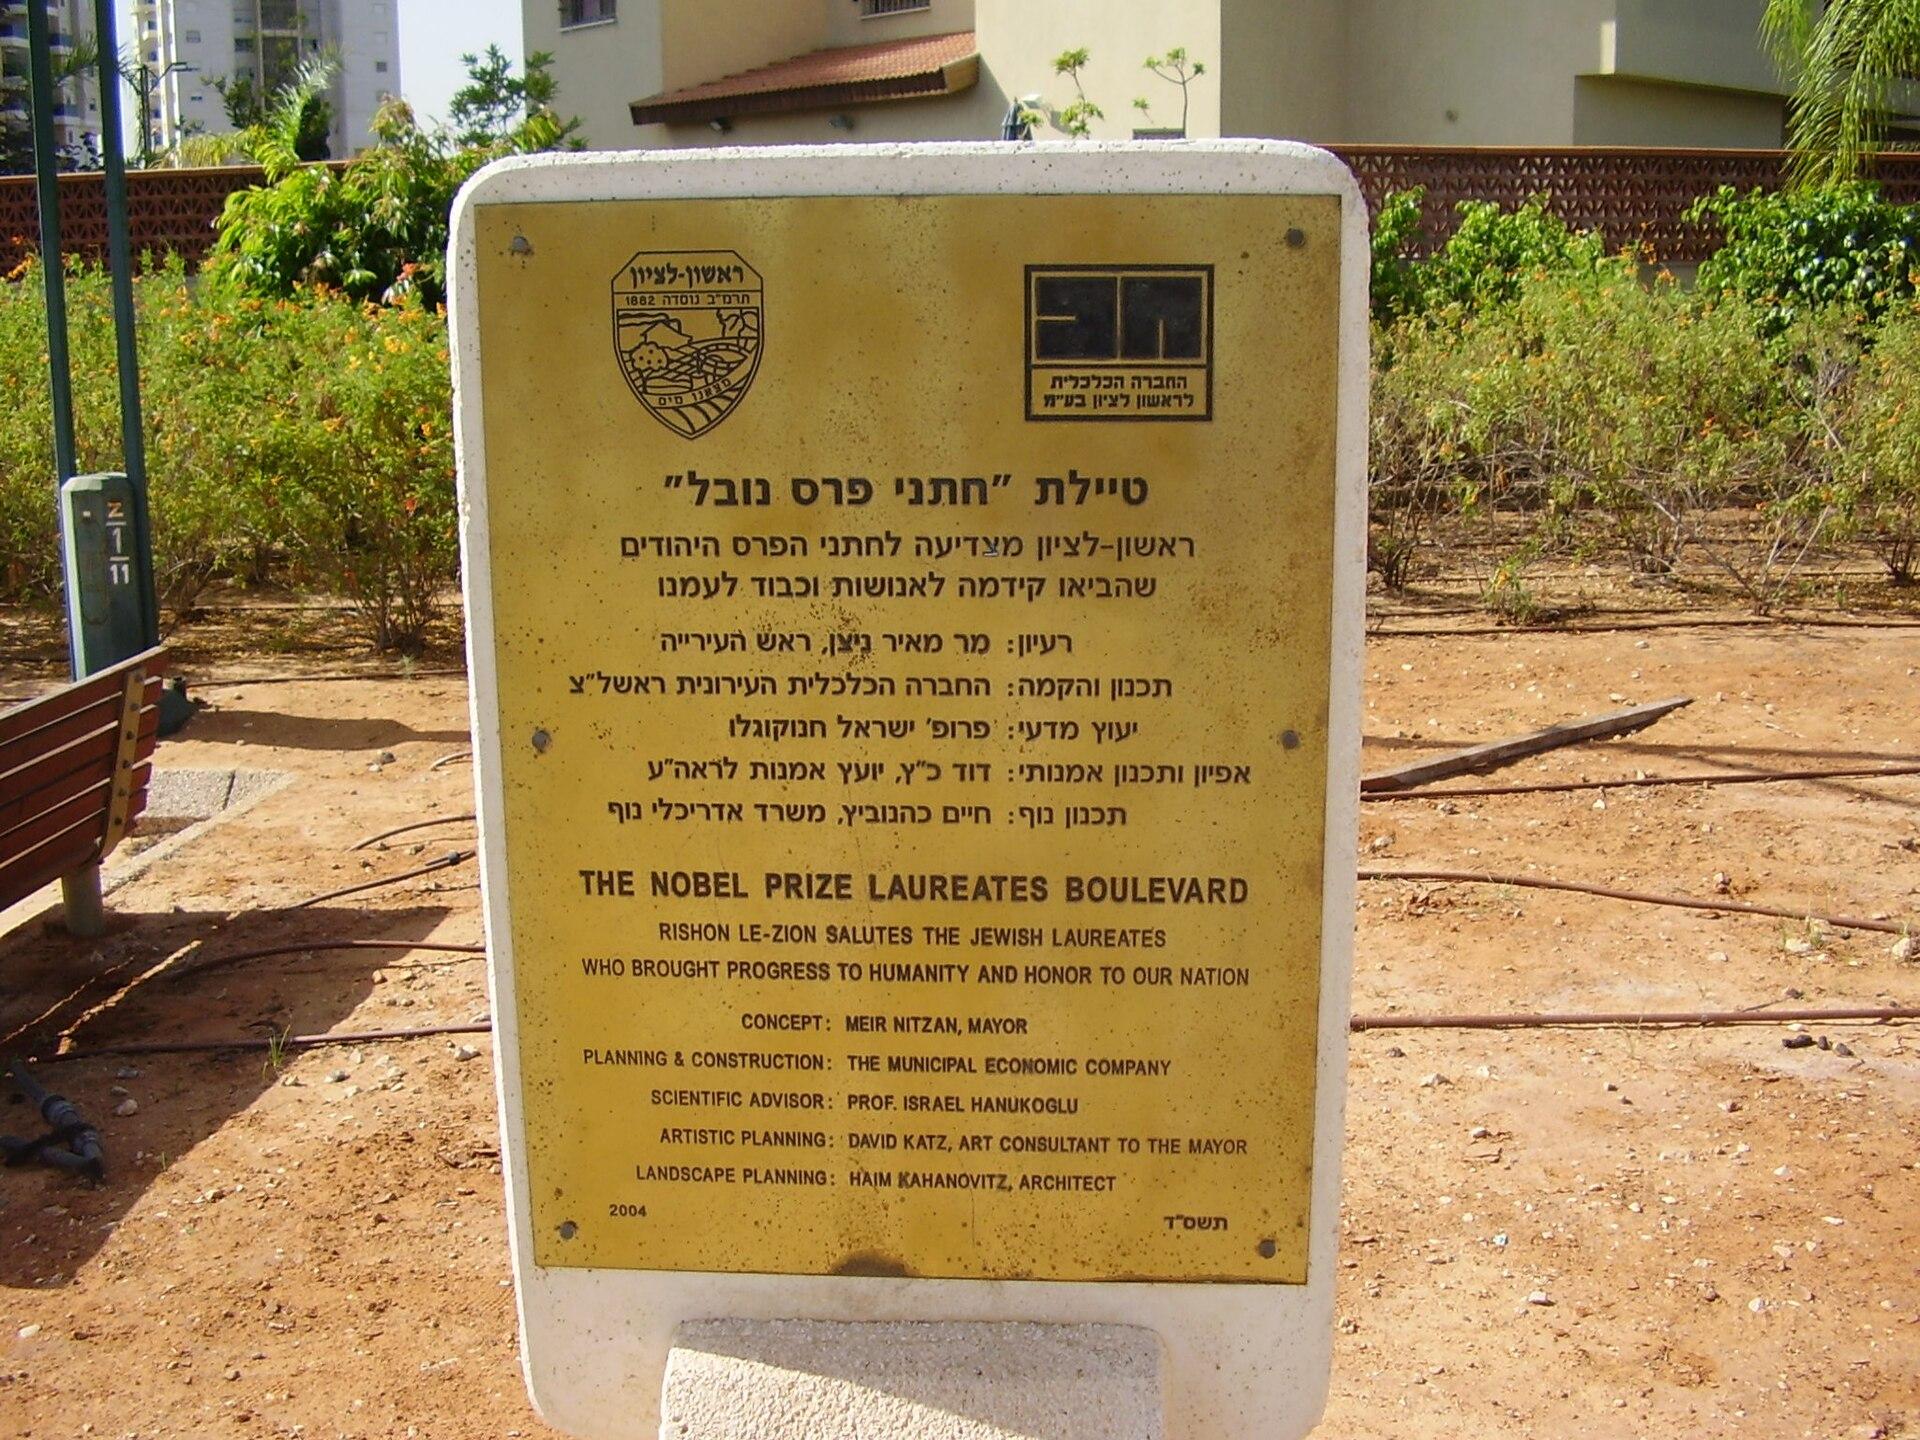 https://upload.wikimedia.org/wikipedia/commons/thumb/1/14/PikiWiki_Israel_9696_jewish_laureates_promenade_in_rishon_lezion.jpg/1920px-PikiWiki_Israel_9696_jewish_laureates_promenade_in_rishon_lezion.jpg